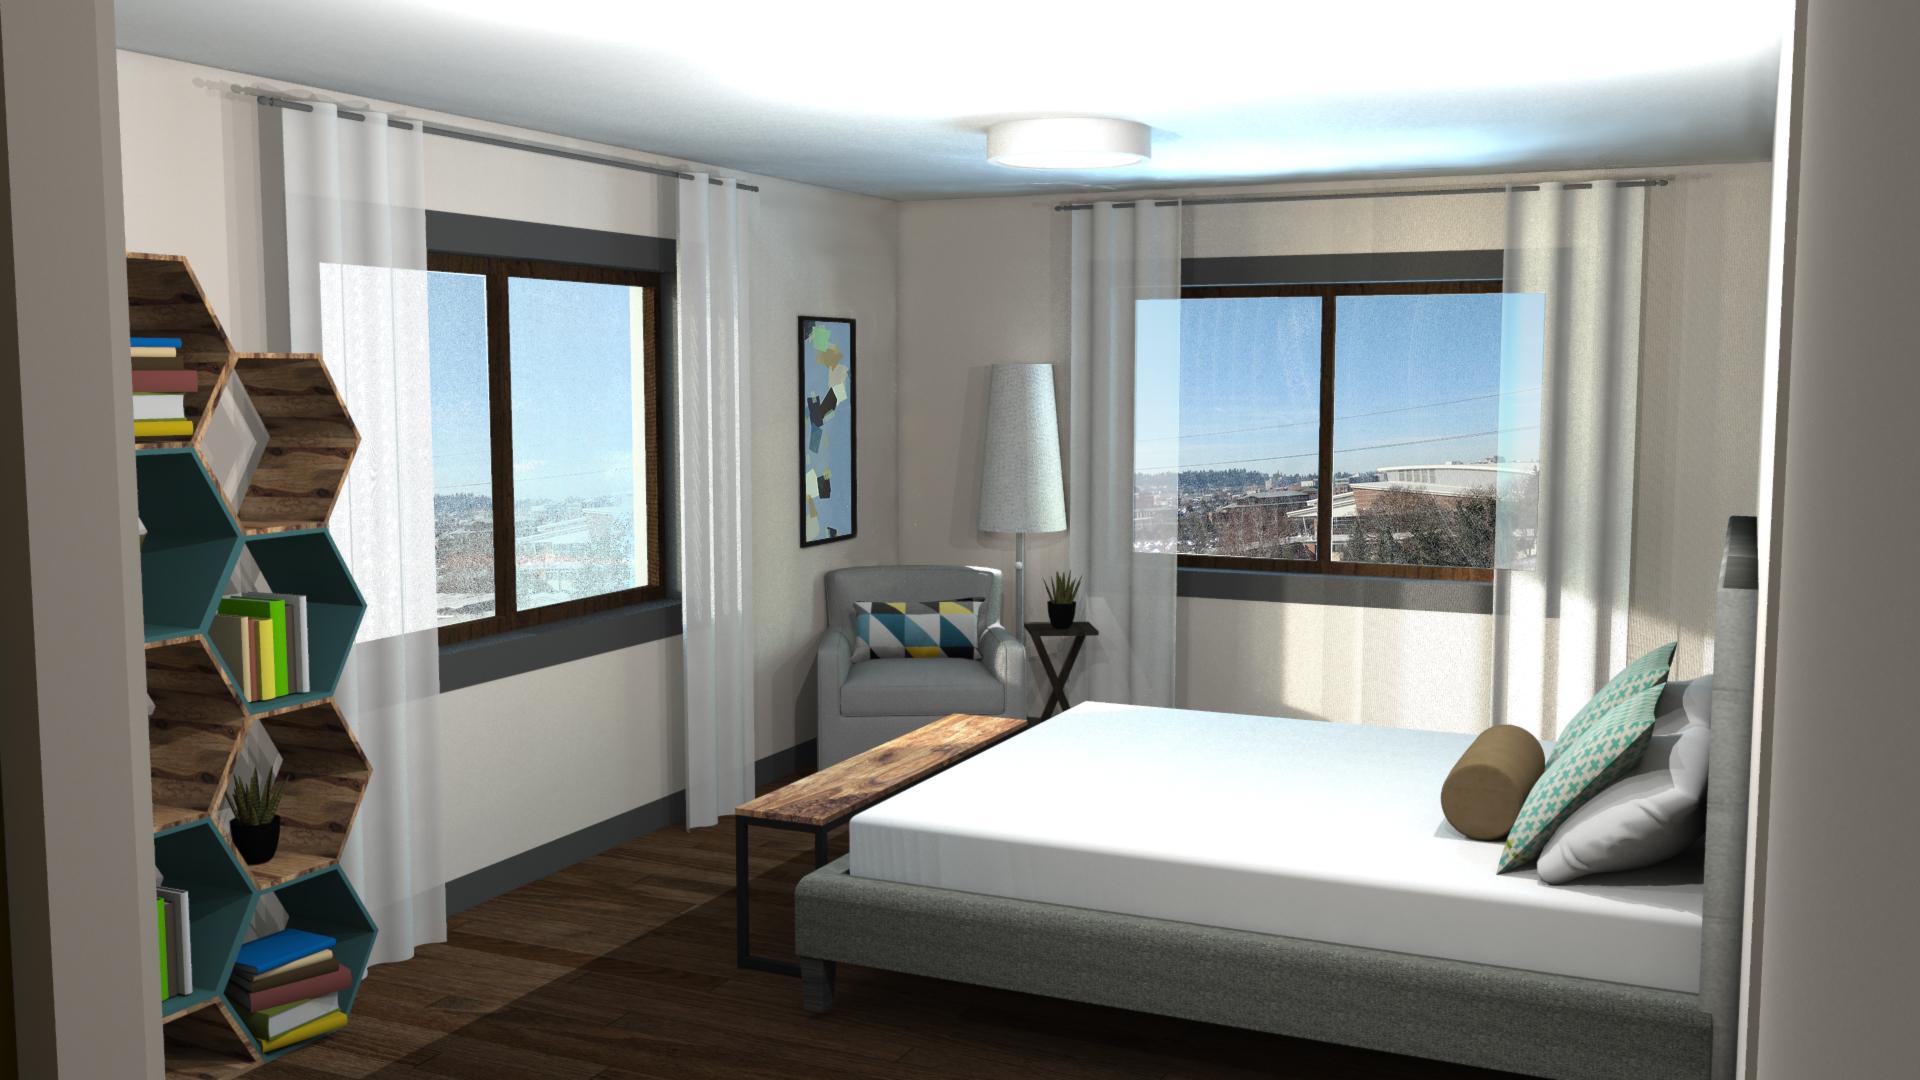 Bedroom Furniture Spokane Bedroom Furniture Spokane Bedroom Furniture Reviews